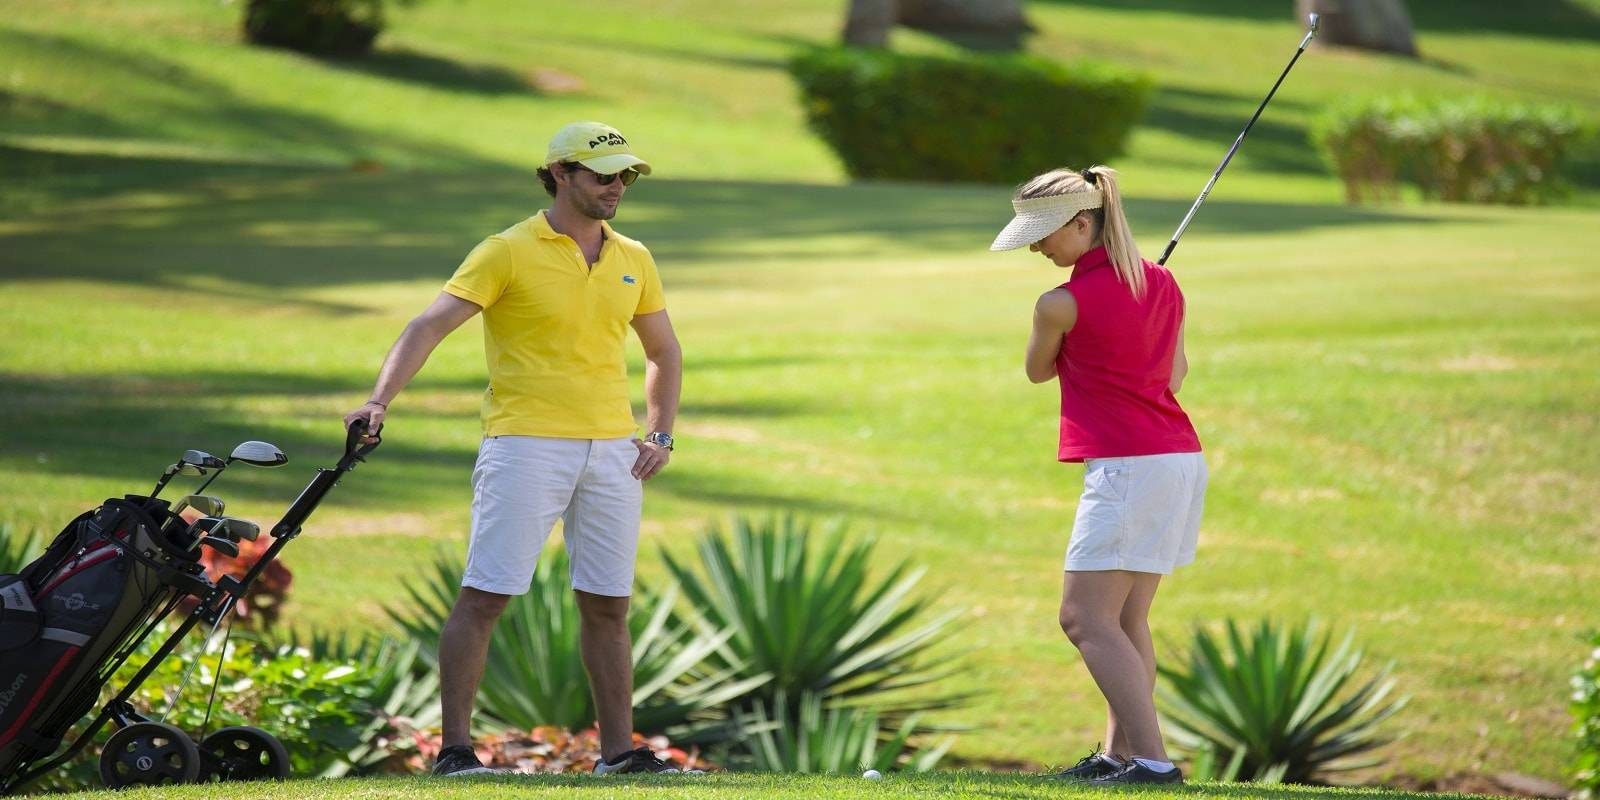 Le Maritim Golf Club, Balaclava à l'ile maurice